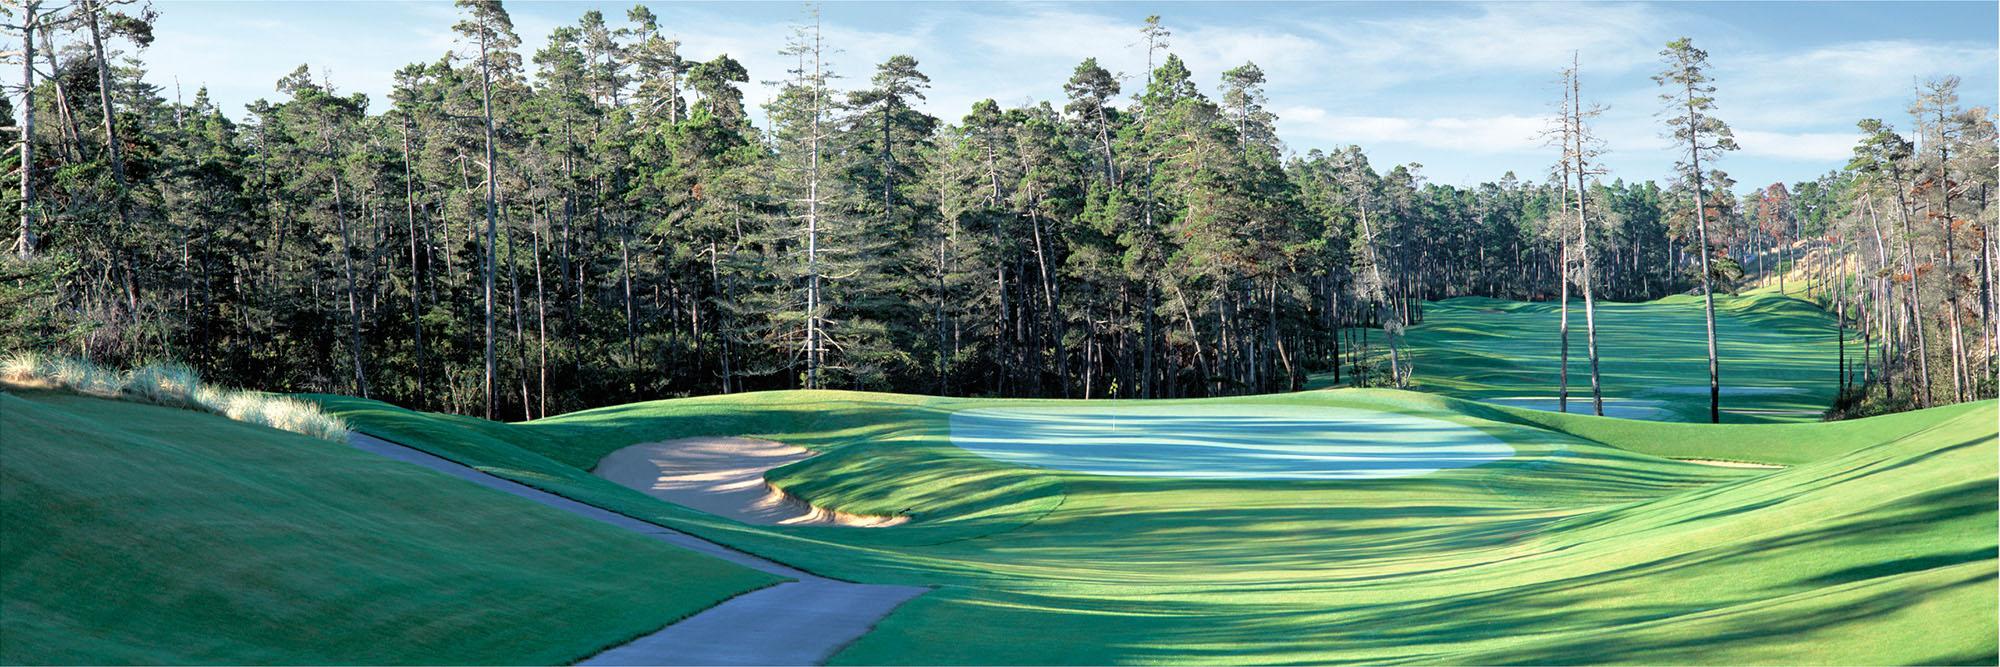 Golf Course Image - Sandpines No. 8